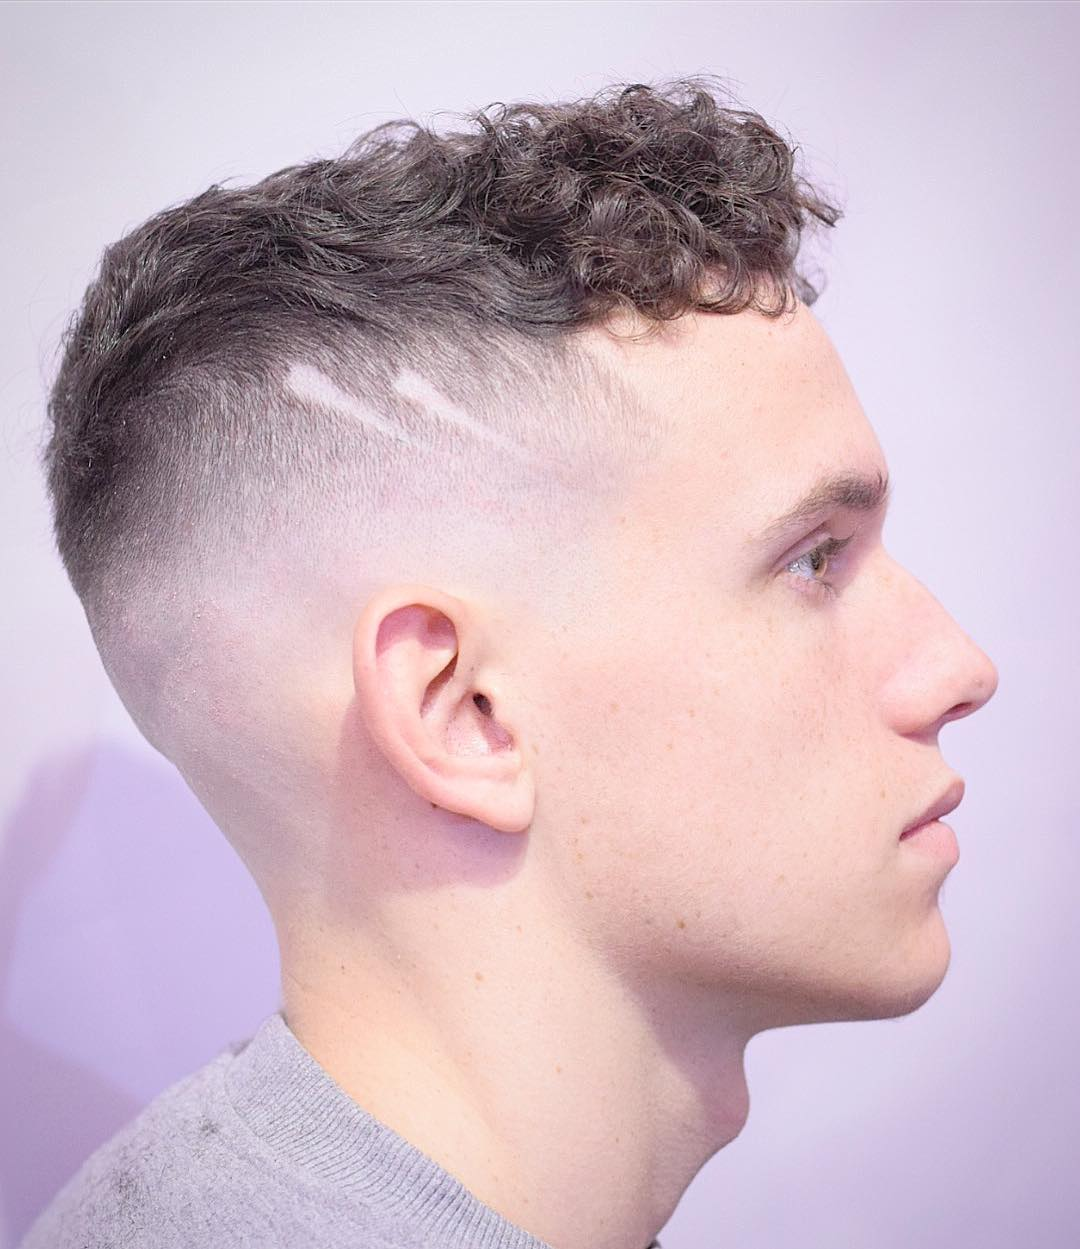 Curlkalon Shaven Sides